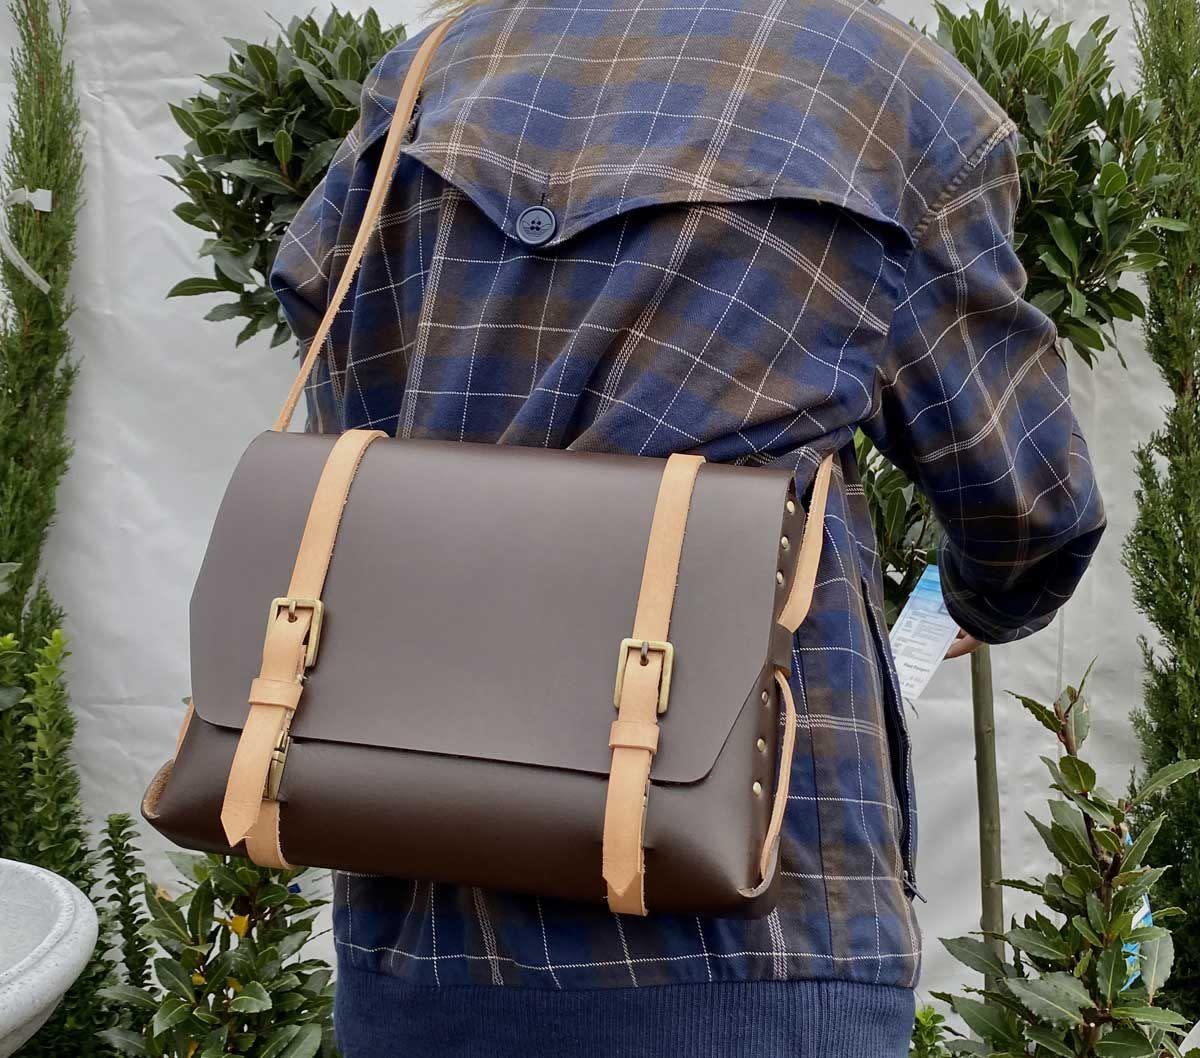 The Grenadier Bag is stylish and versatile Raksha Bandhan gift for your sibling.